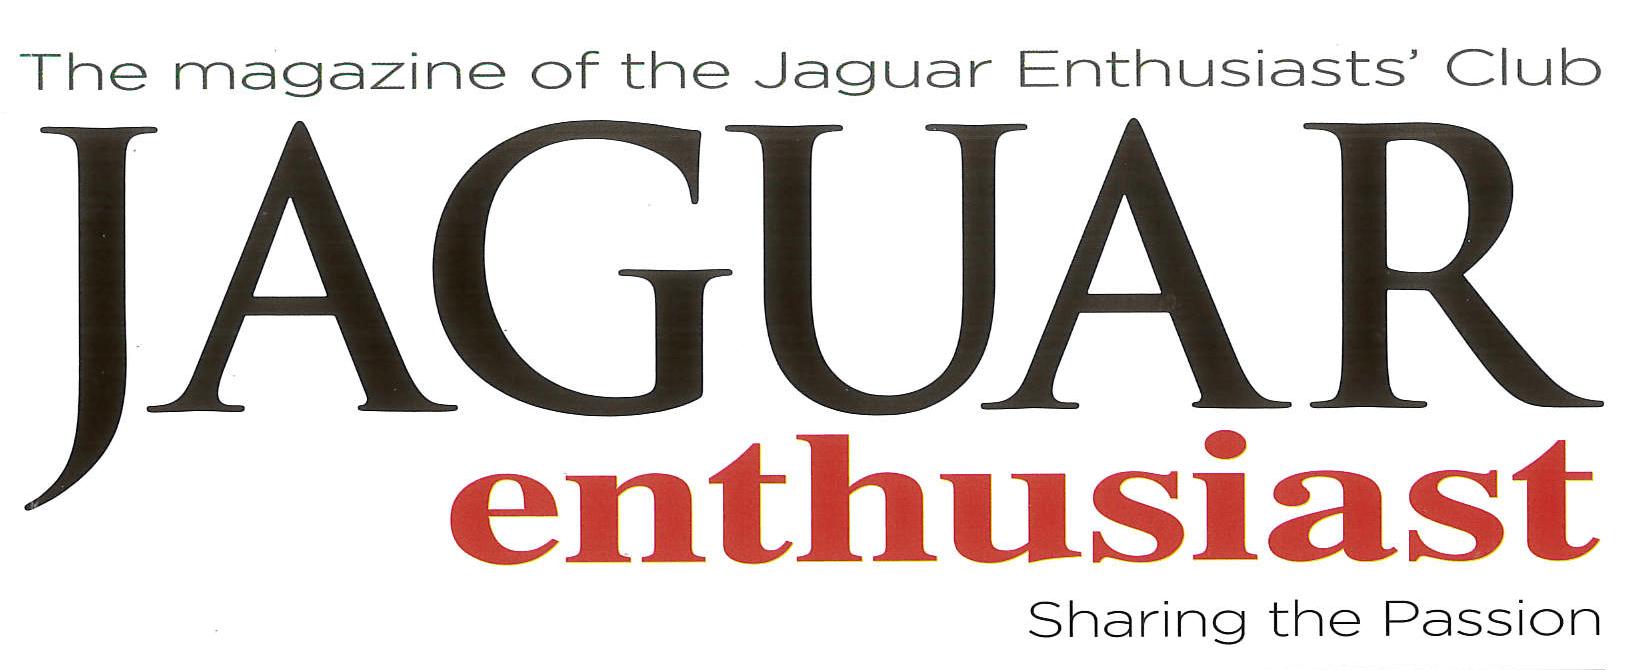 Jaguar Enthusiast Magazine Valvemaster offer